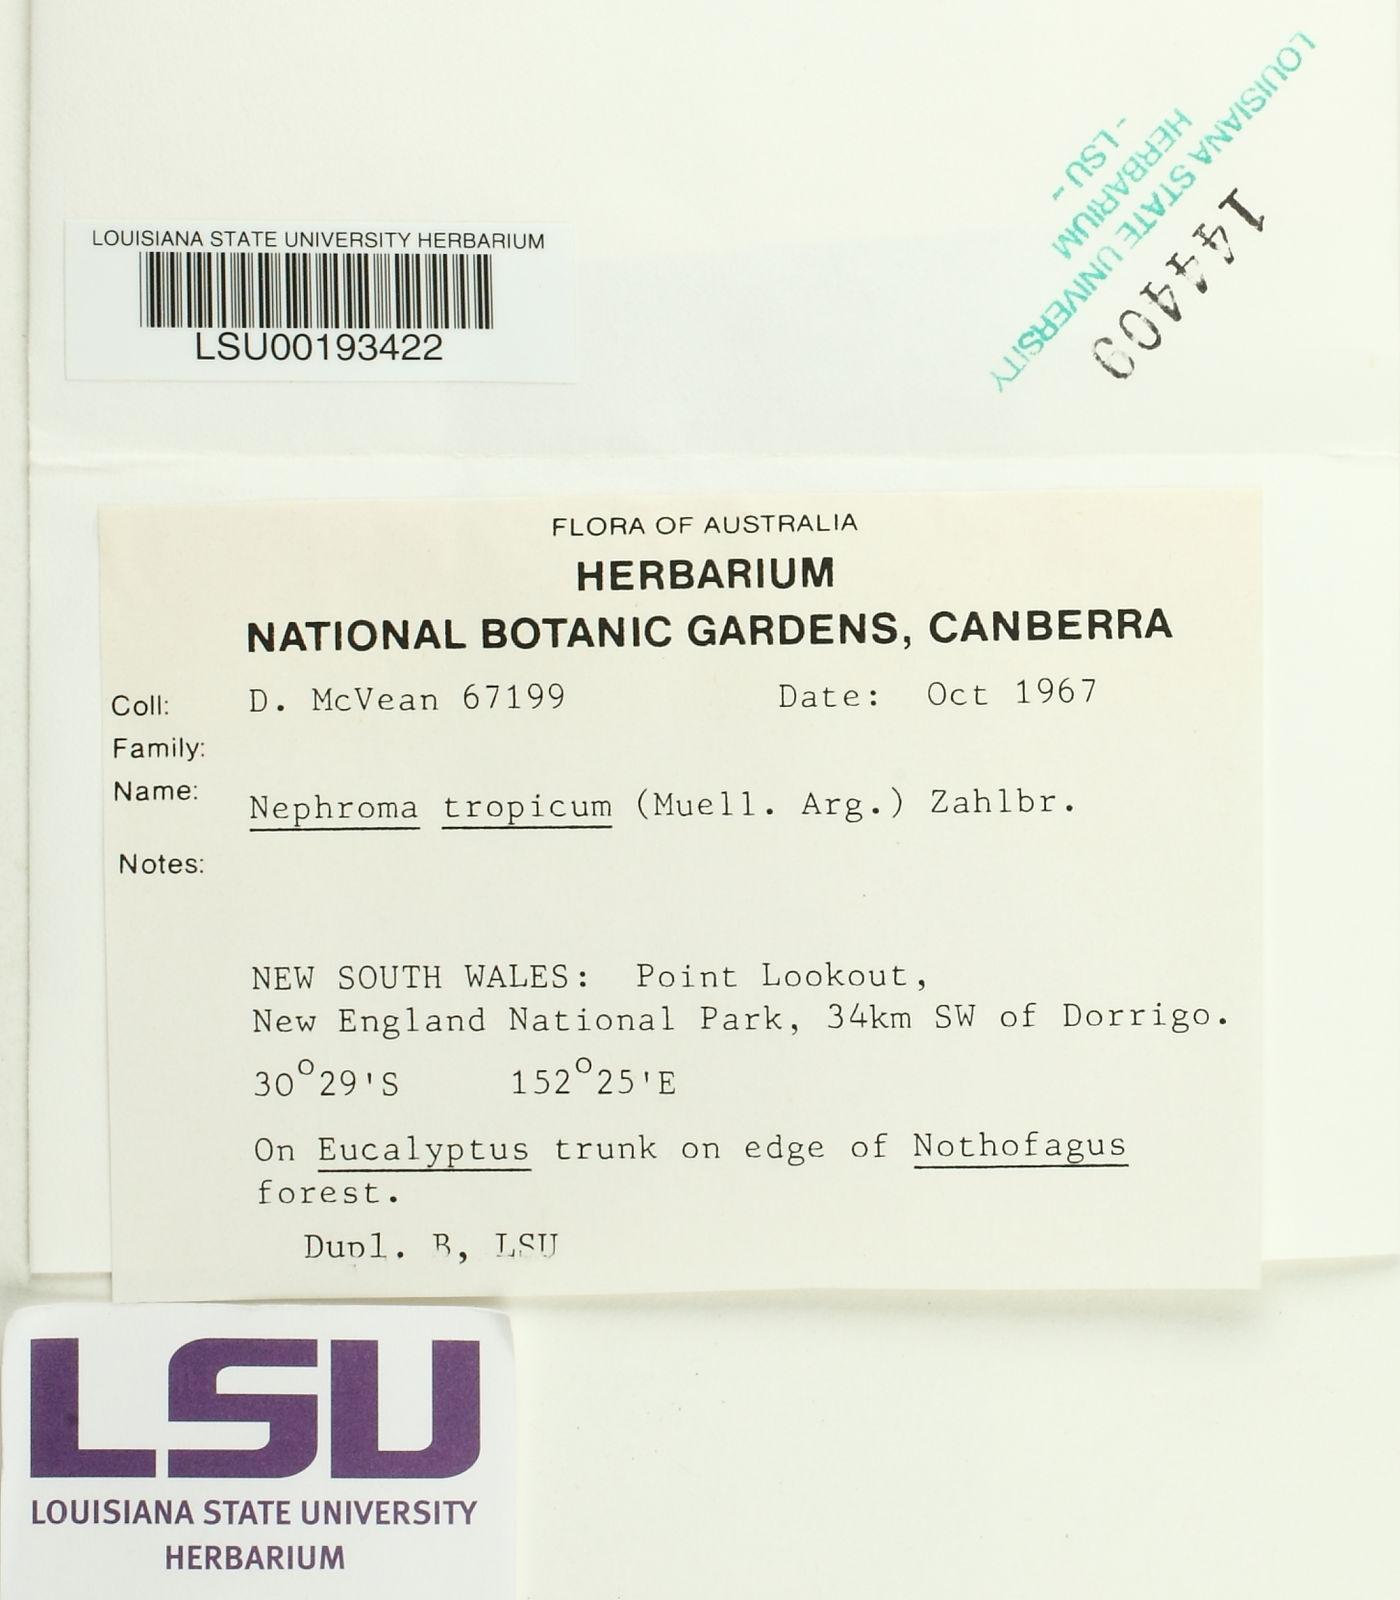 Nephroma tropicum image